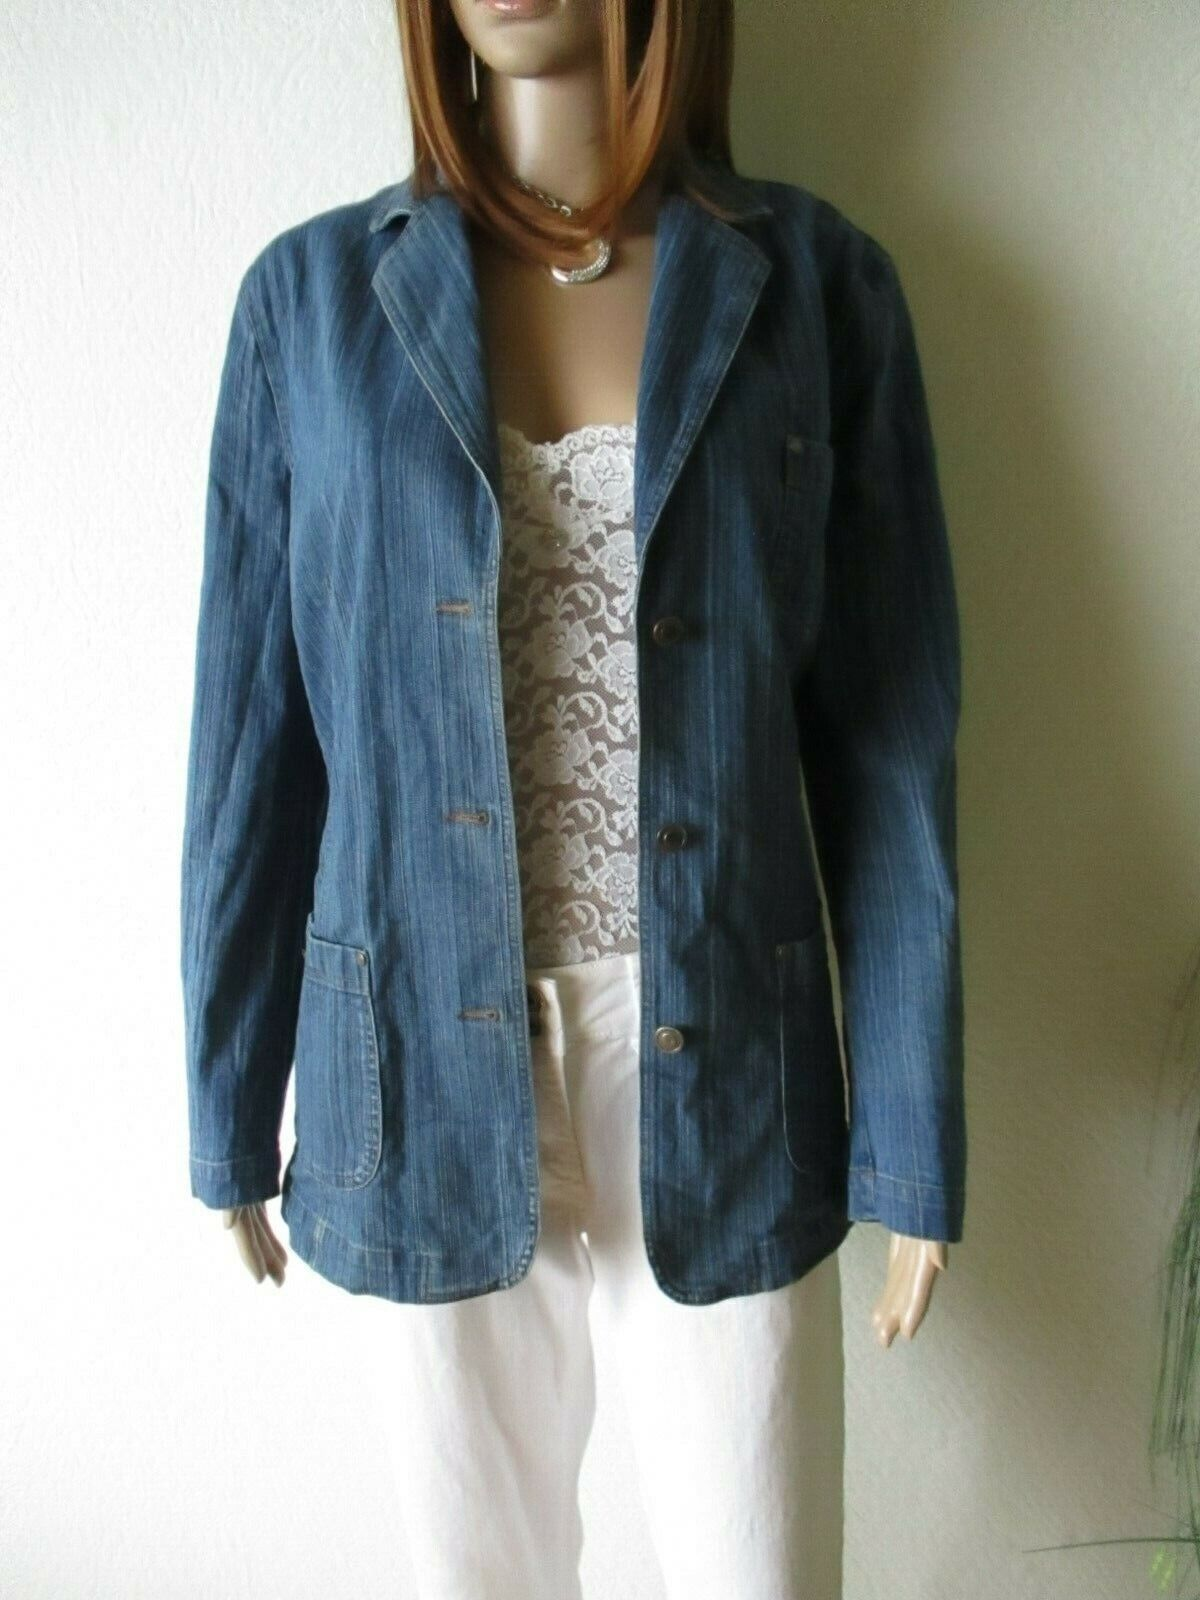 BONITA Jeansjacke Jacke Patches Blau Gr 42